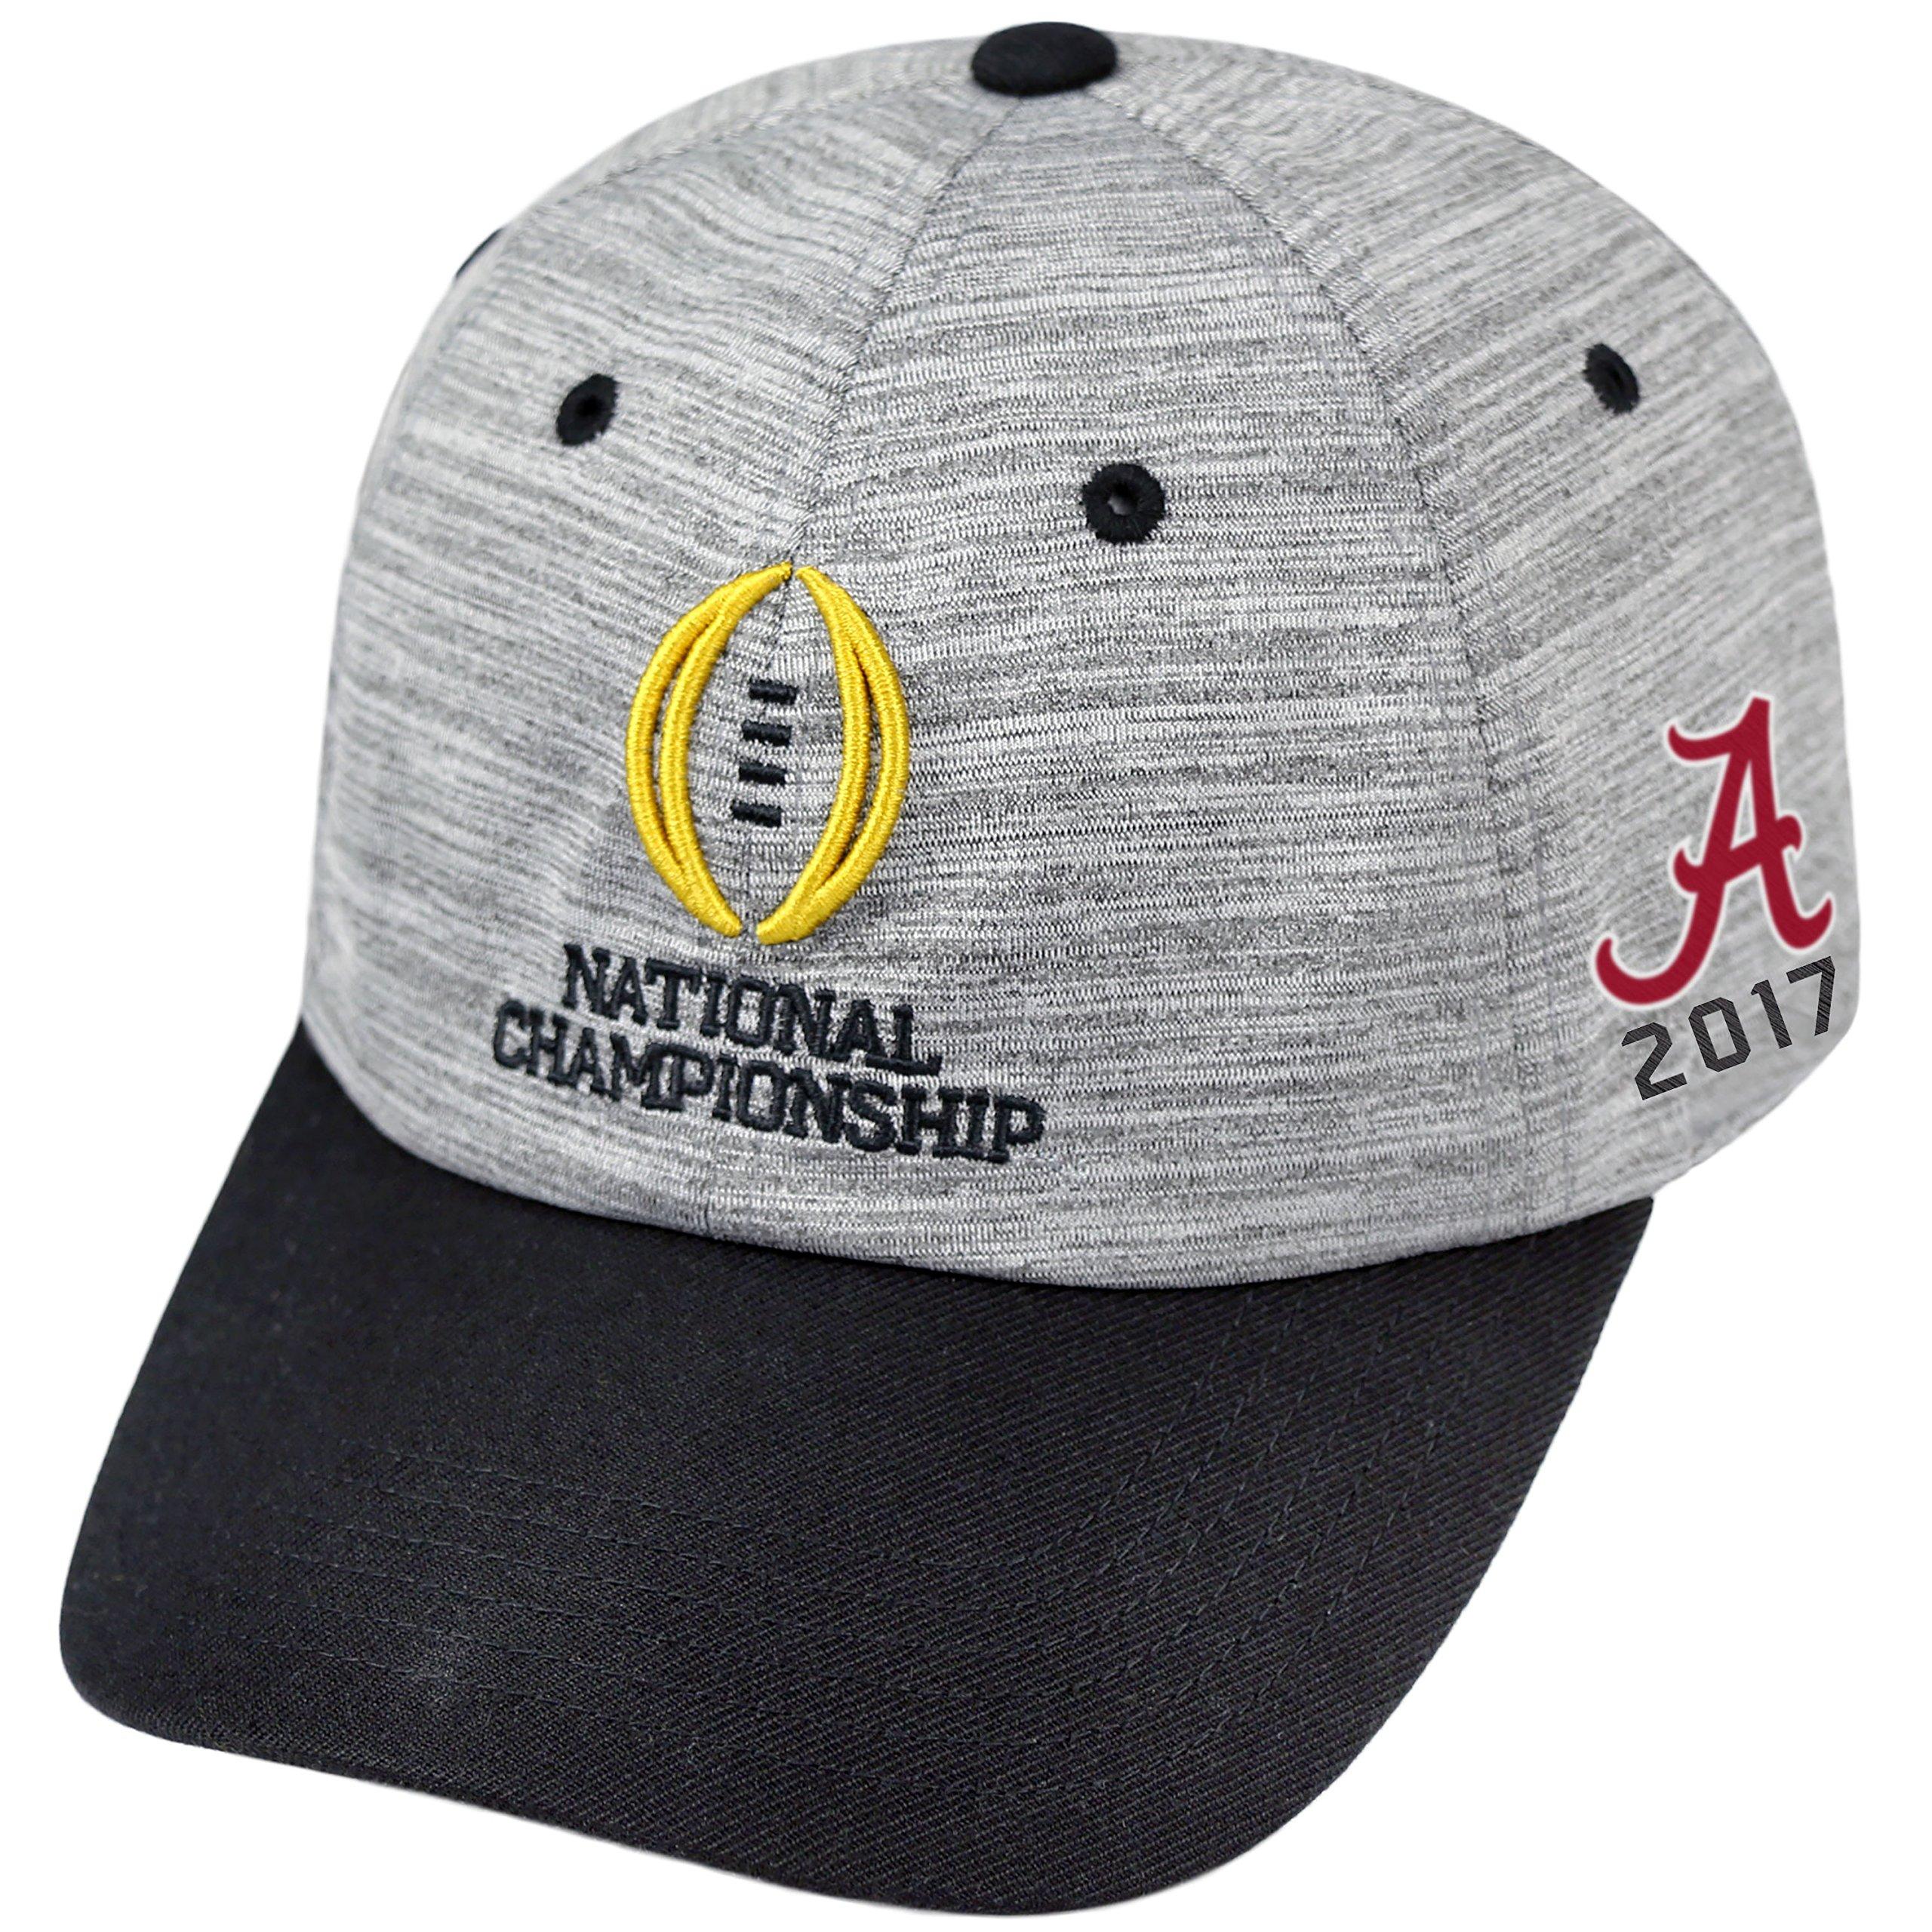 Alabama Crimson Tide 2017 College Football Playoff Championship Game Adj Hat Cap